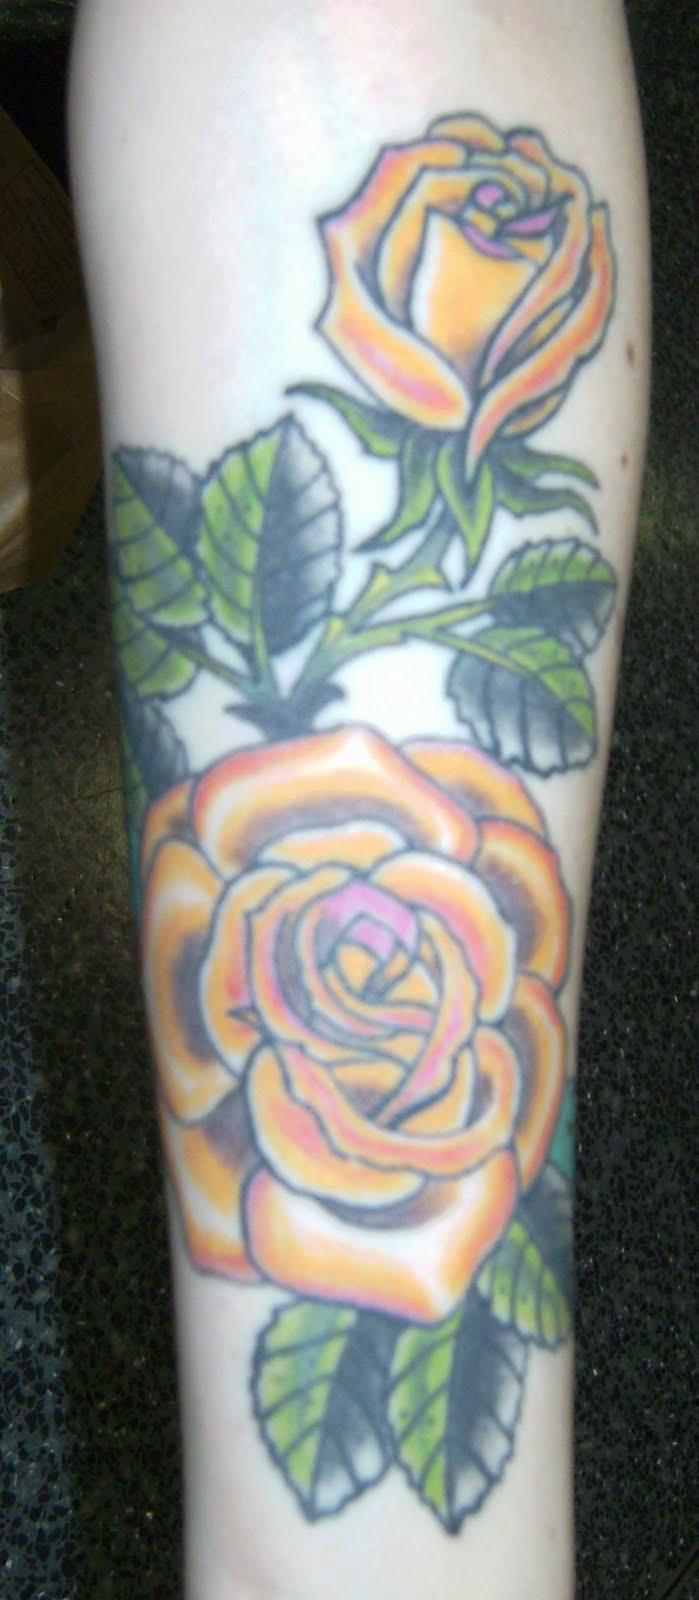 http://1.bp.blogspot.com/_ZMdFwon2pfg/TAFkqmlHuXI/AAAAAAAAKXs/r9JkaS3-lJk/s1600/Yellow+Roses.jpg